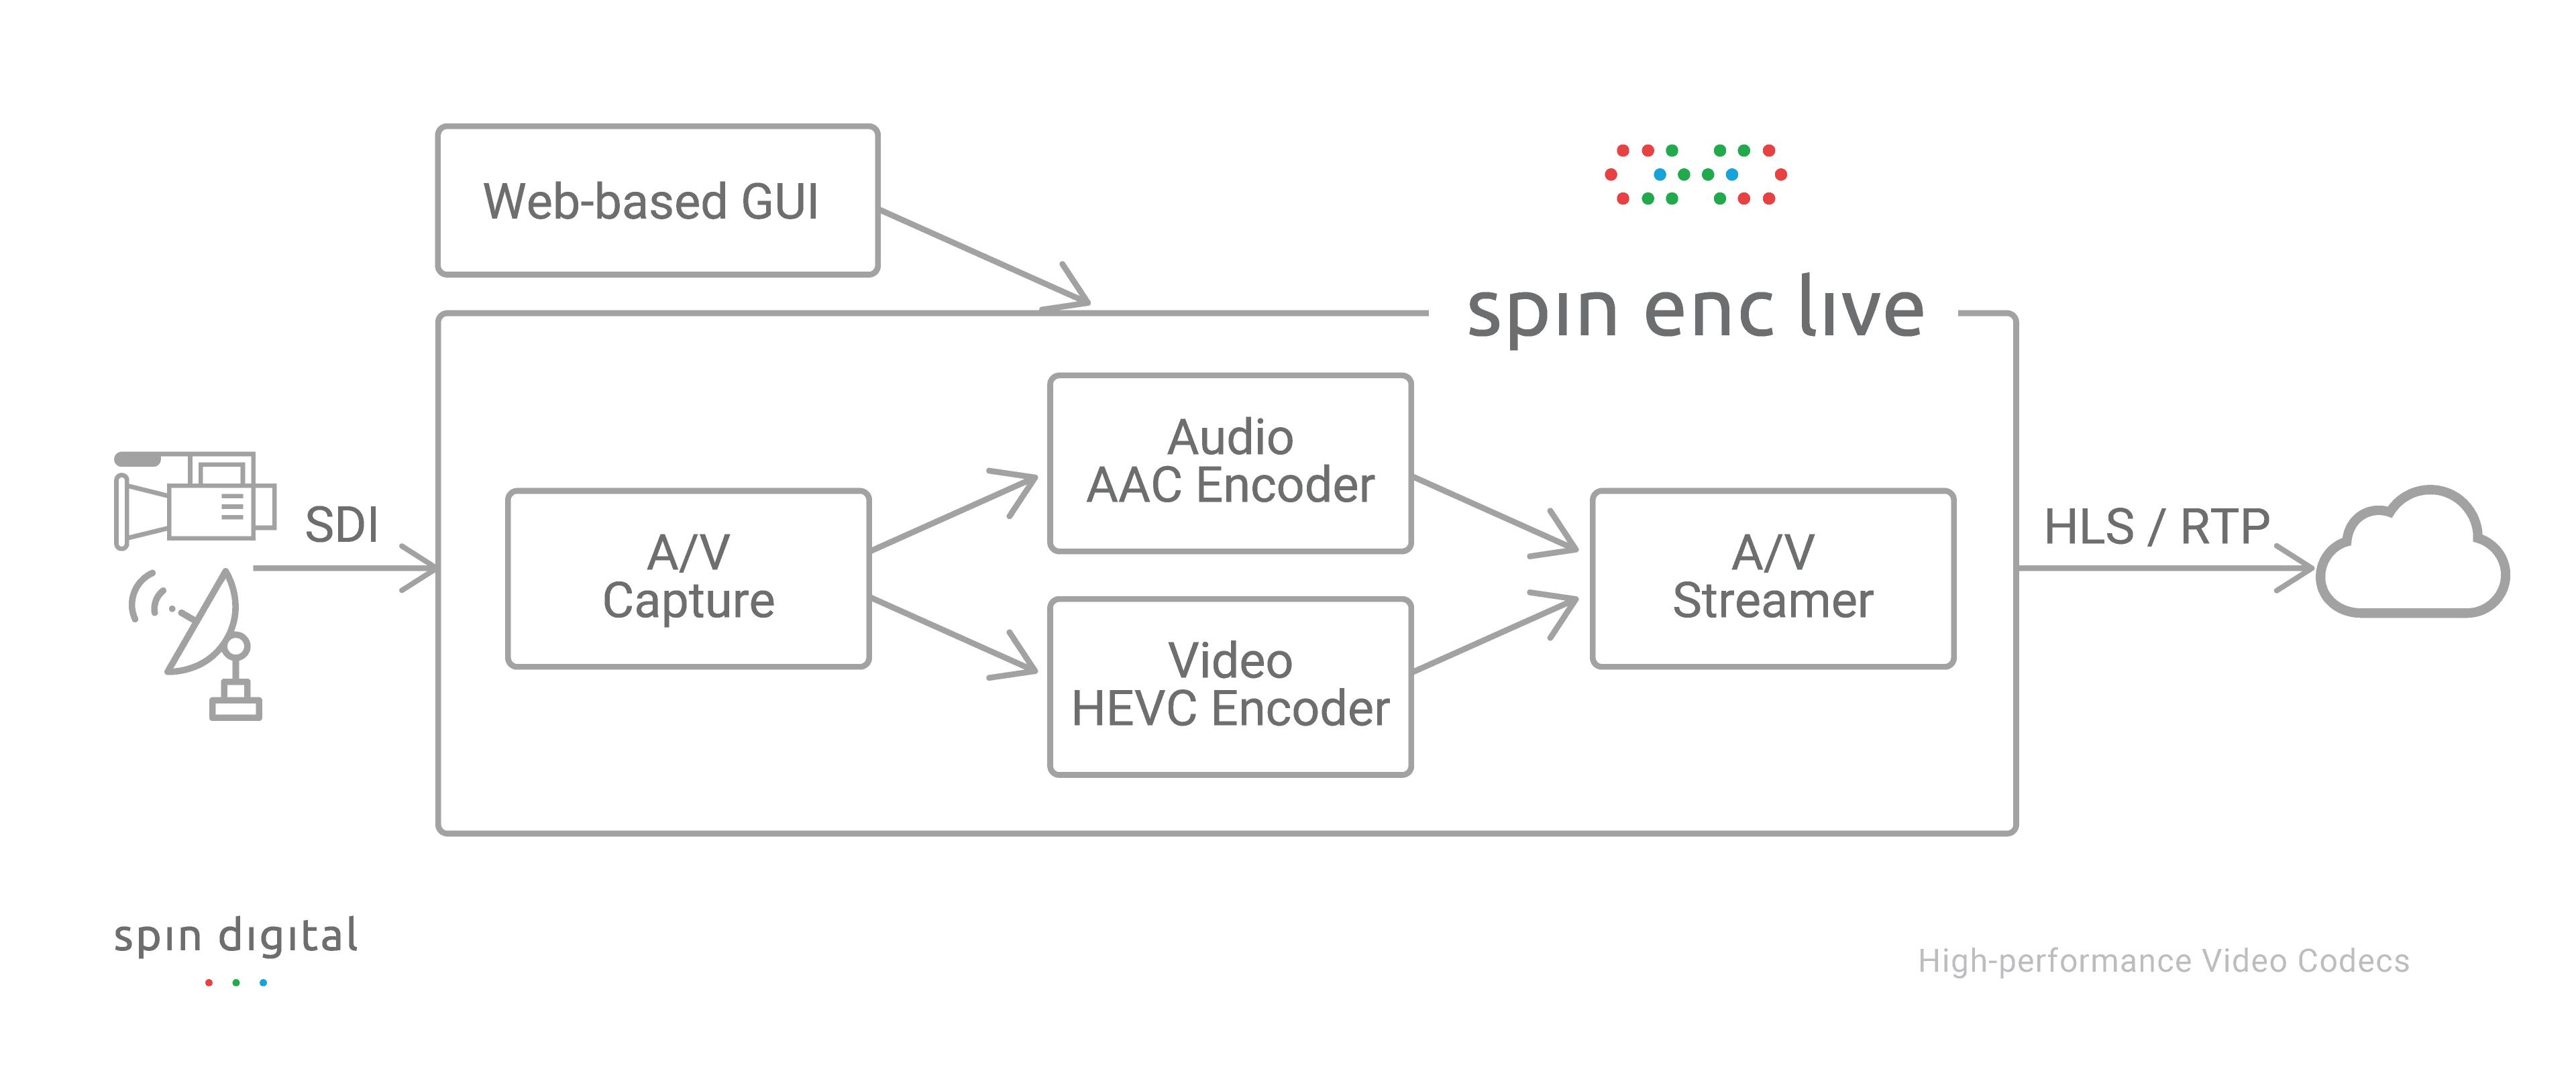 Block diagram of Spin Enc Live